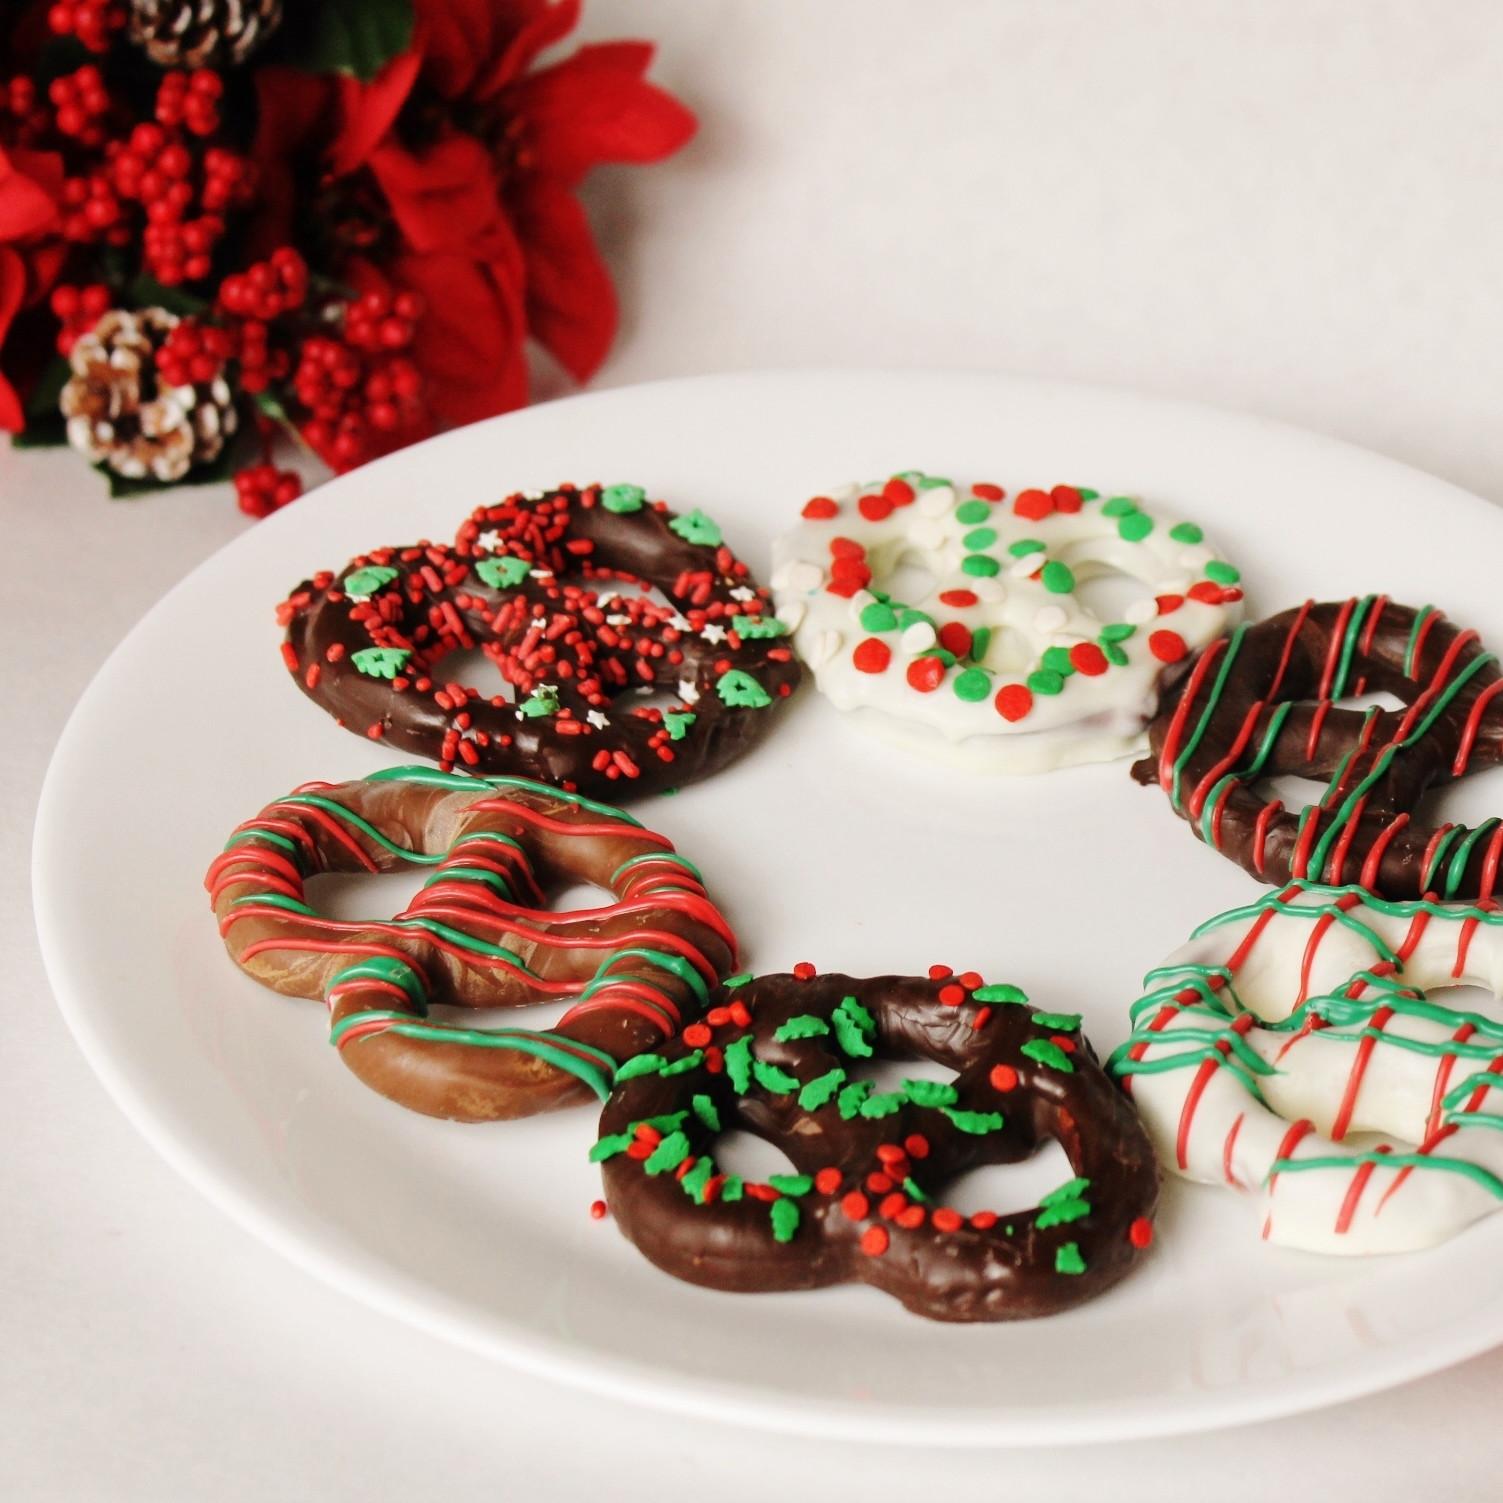 Christmas Dipped Pretzels  Christmas Chocolate Covered Pretzels Knots